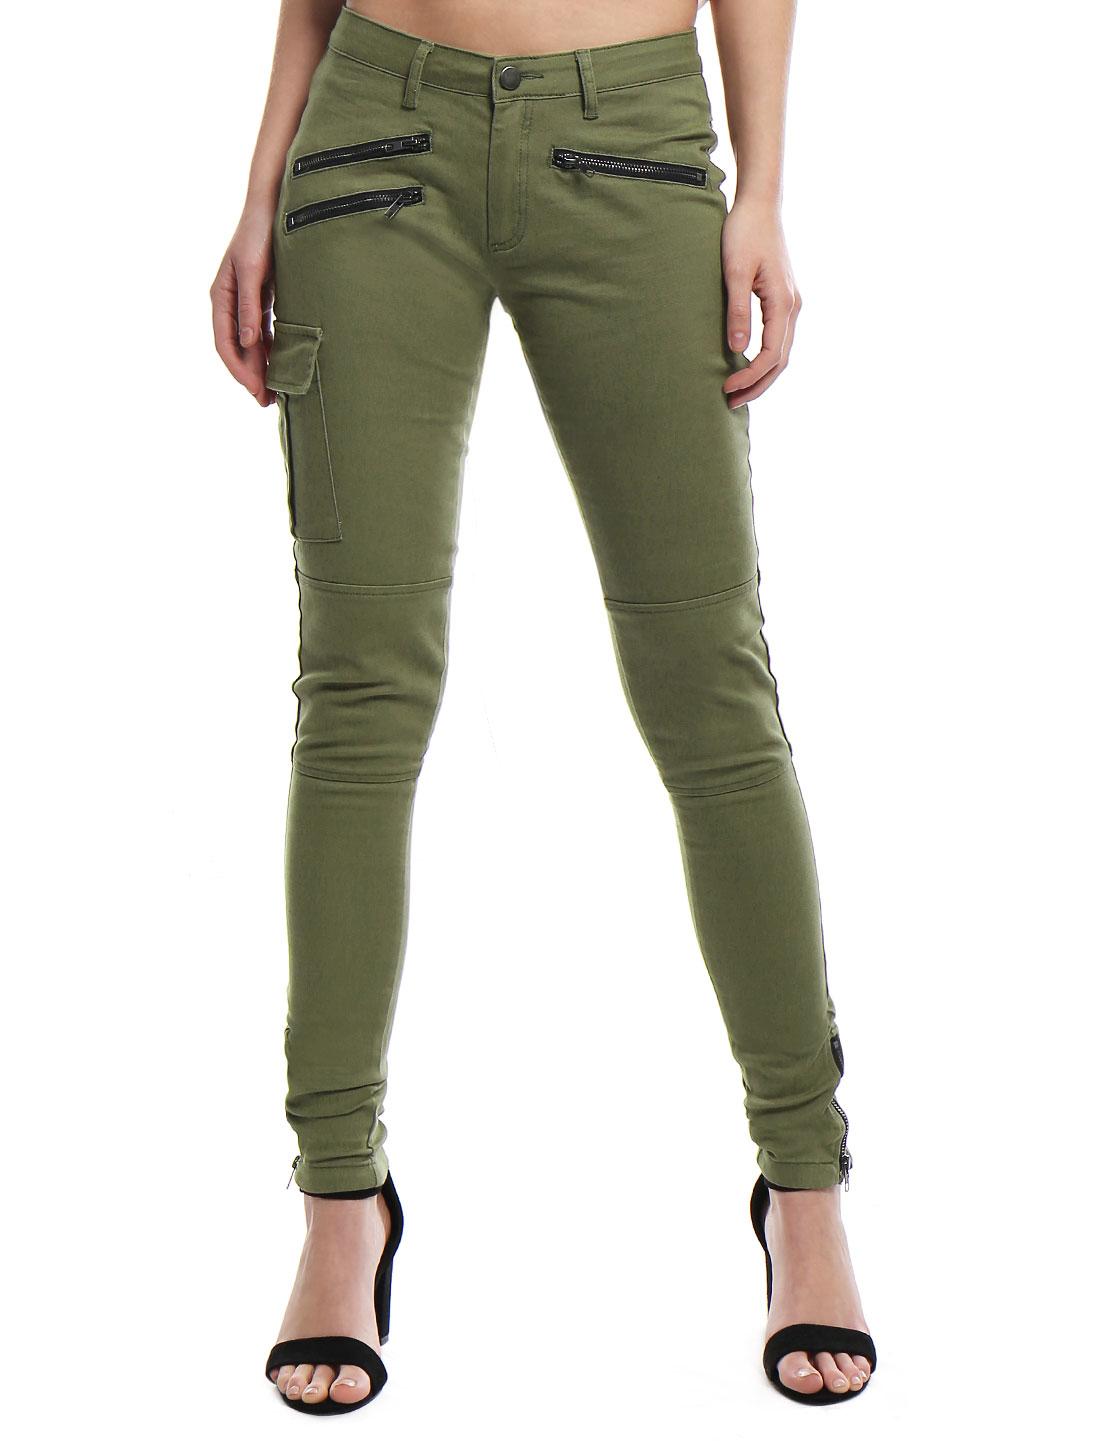 ef4a78300b33a Women Low Rise Zipper Decor Stretchy Skinny Cargo Pants Green/XS (US 2)